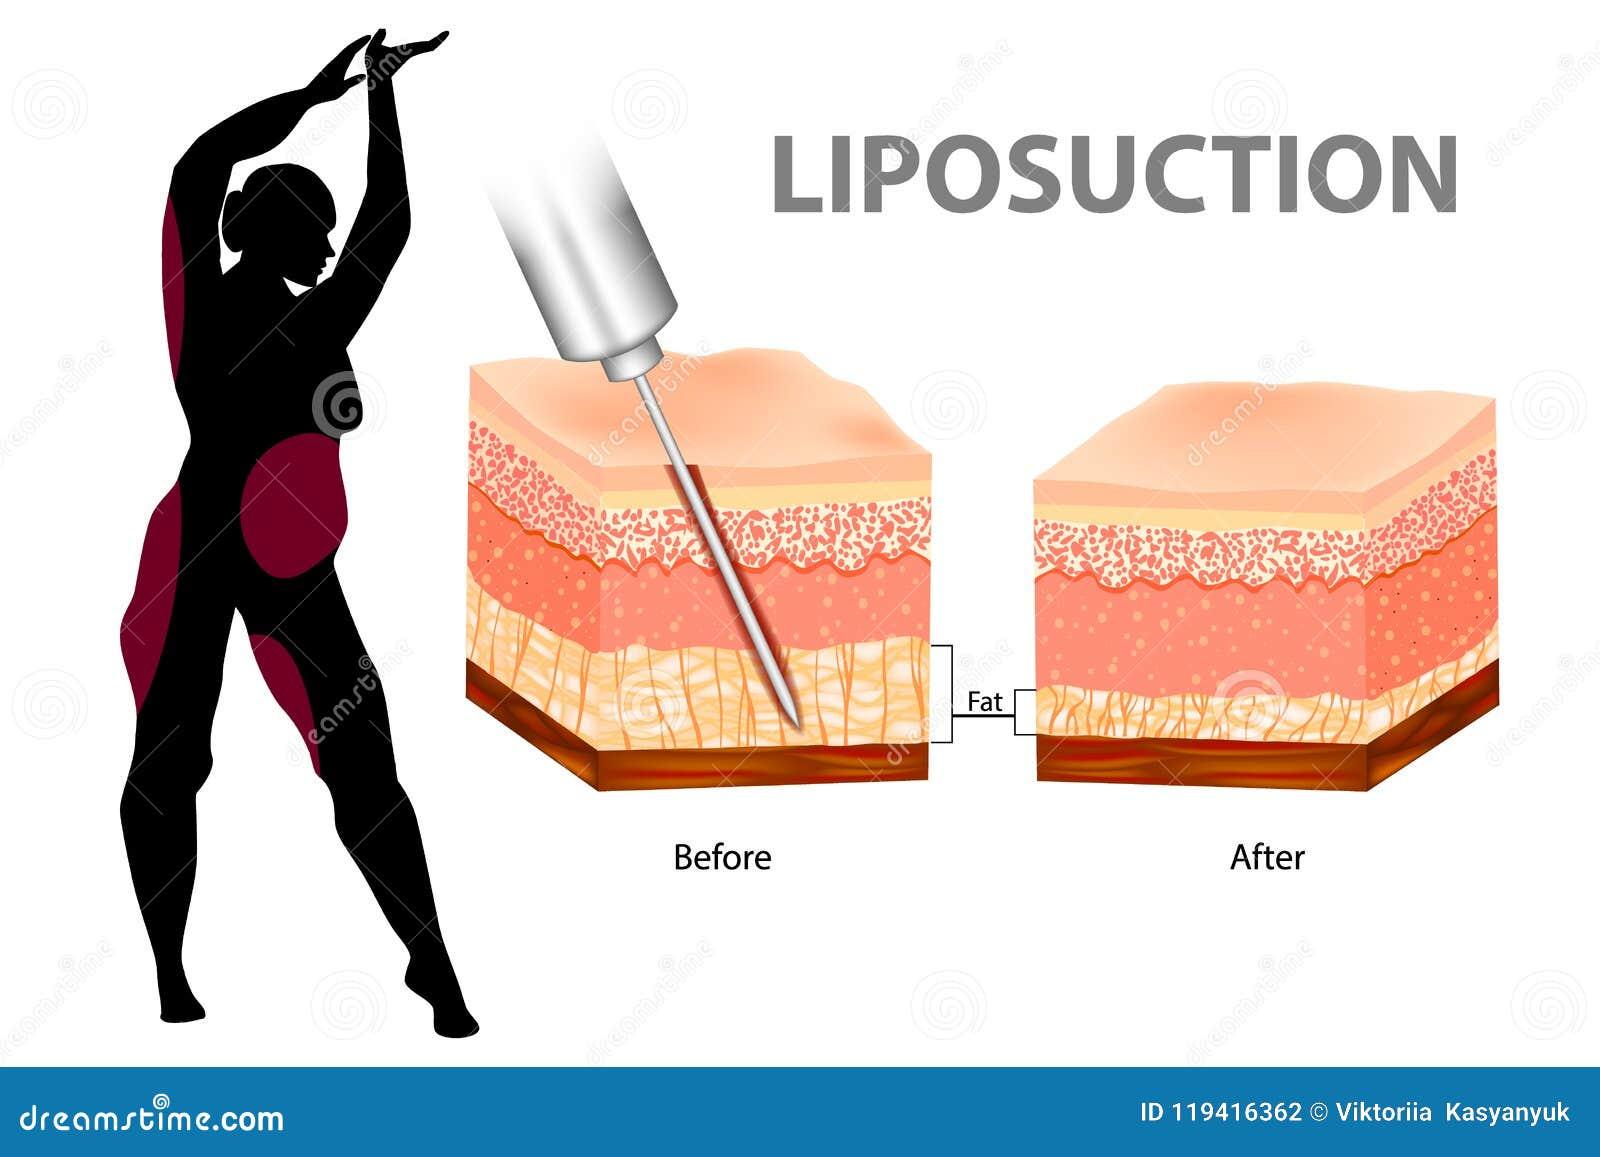 Liposuction Or Lipo  Stock Vector  Illustration Of Deep